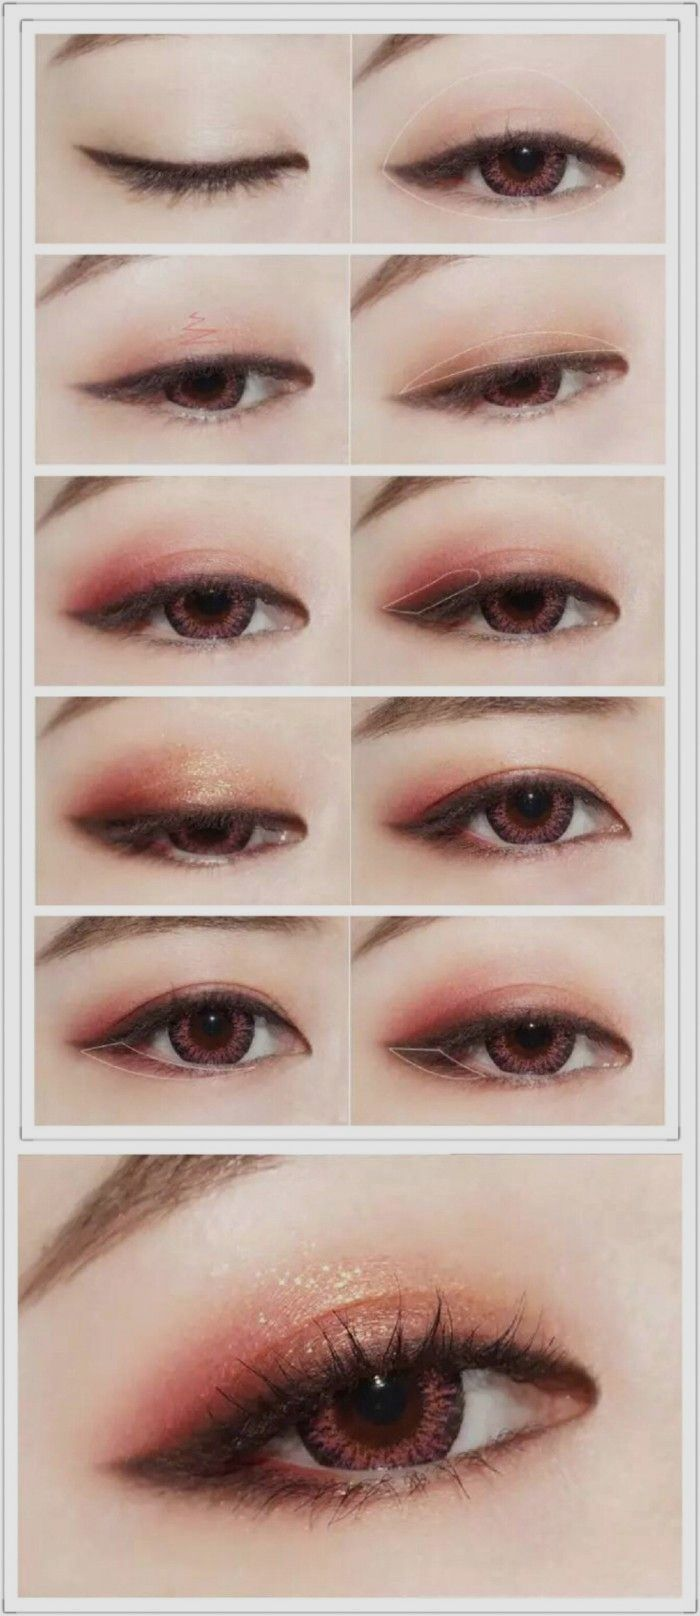 Korean Makeup Hacks Layering Eyeliner And Shadow Could Be Used To Make Eyes Look Bigger Apply Your Prime Korean Eye Makeup Korean Makeup Tips Asian Eye Makeup